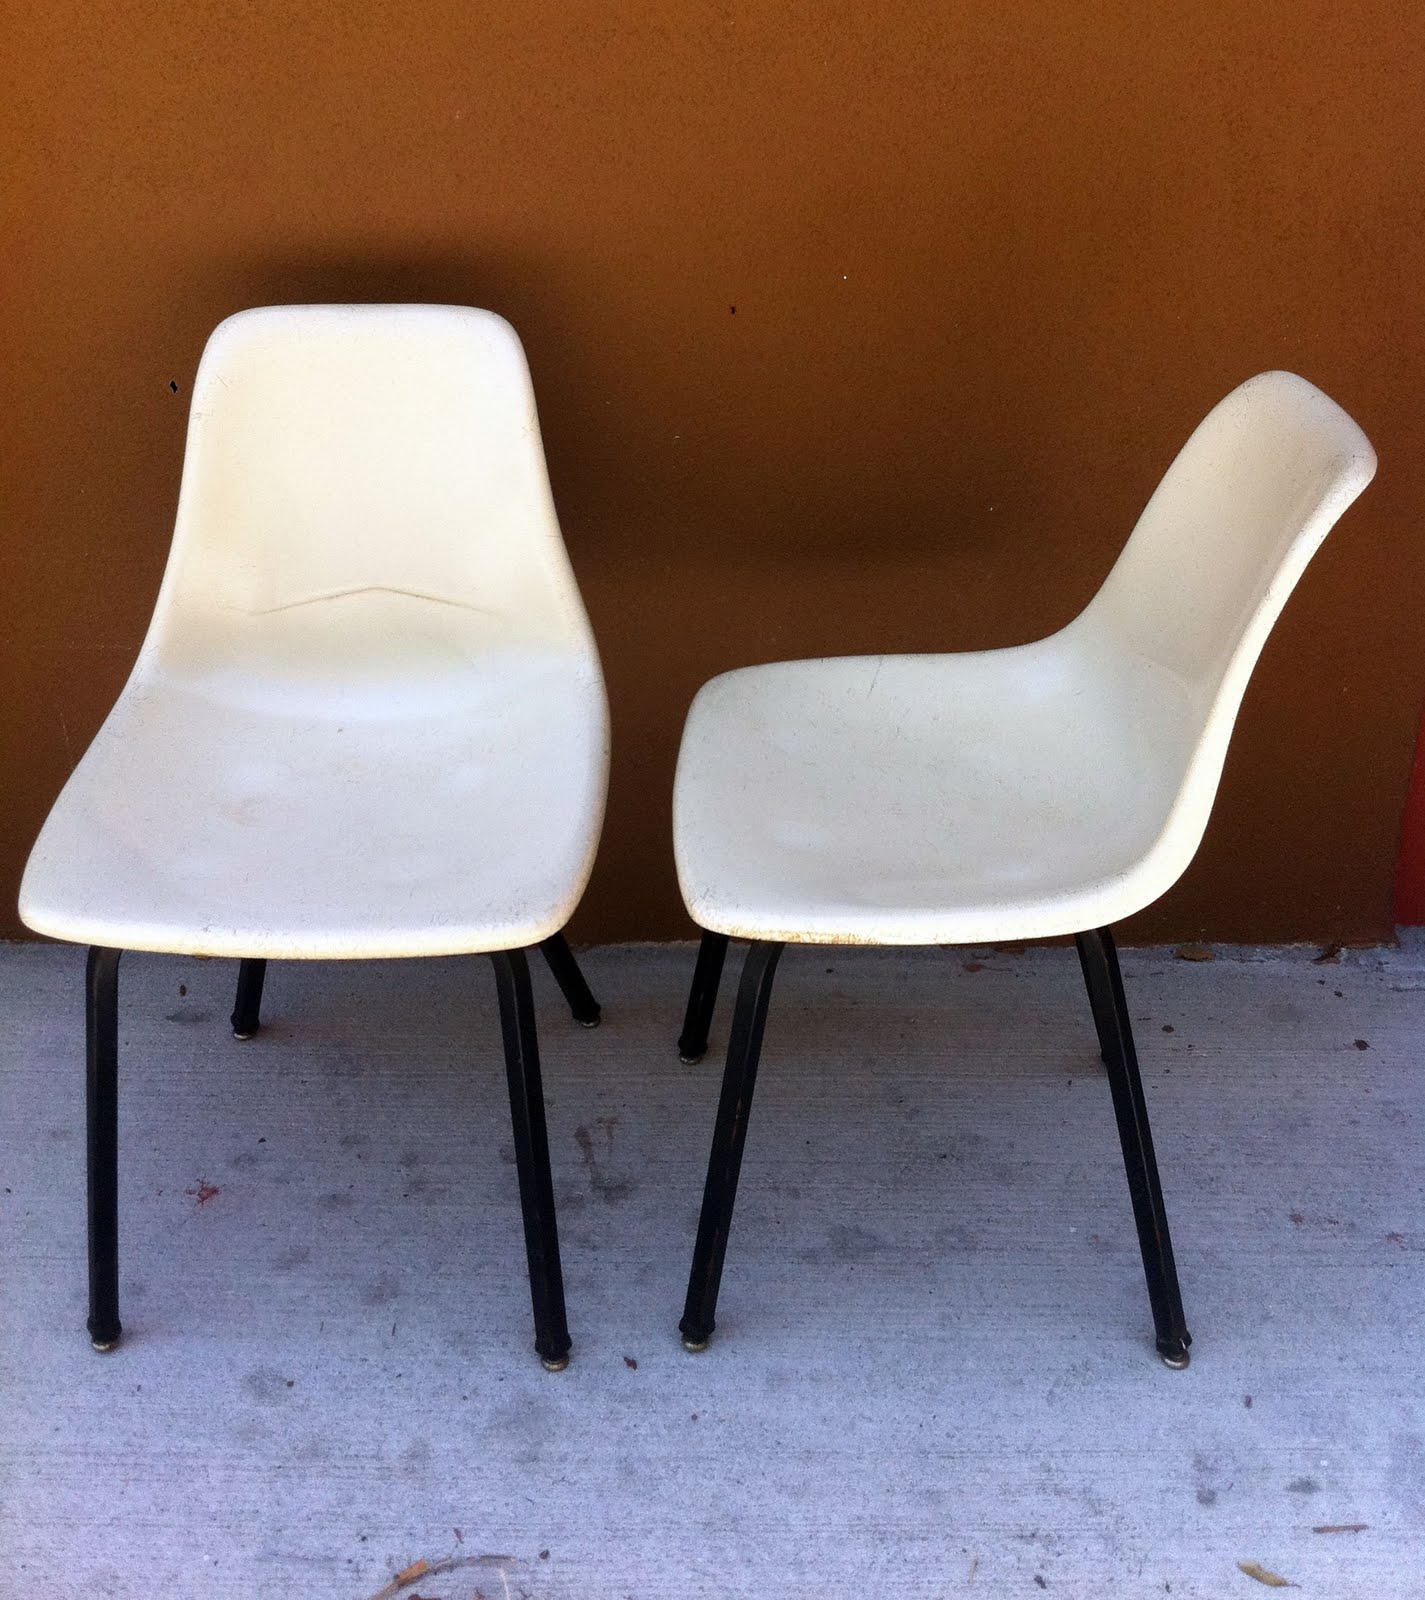 White Shell Chair Little Girl Rocking Junk2funk 2 Vintage Retro Fiberform Fiberglass